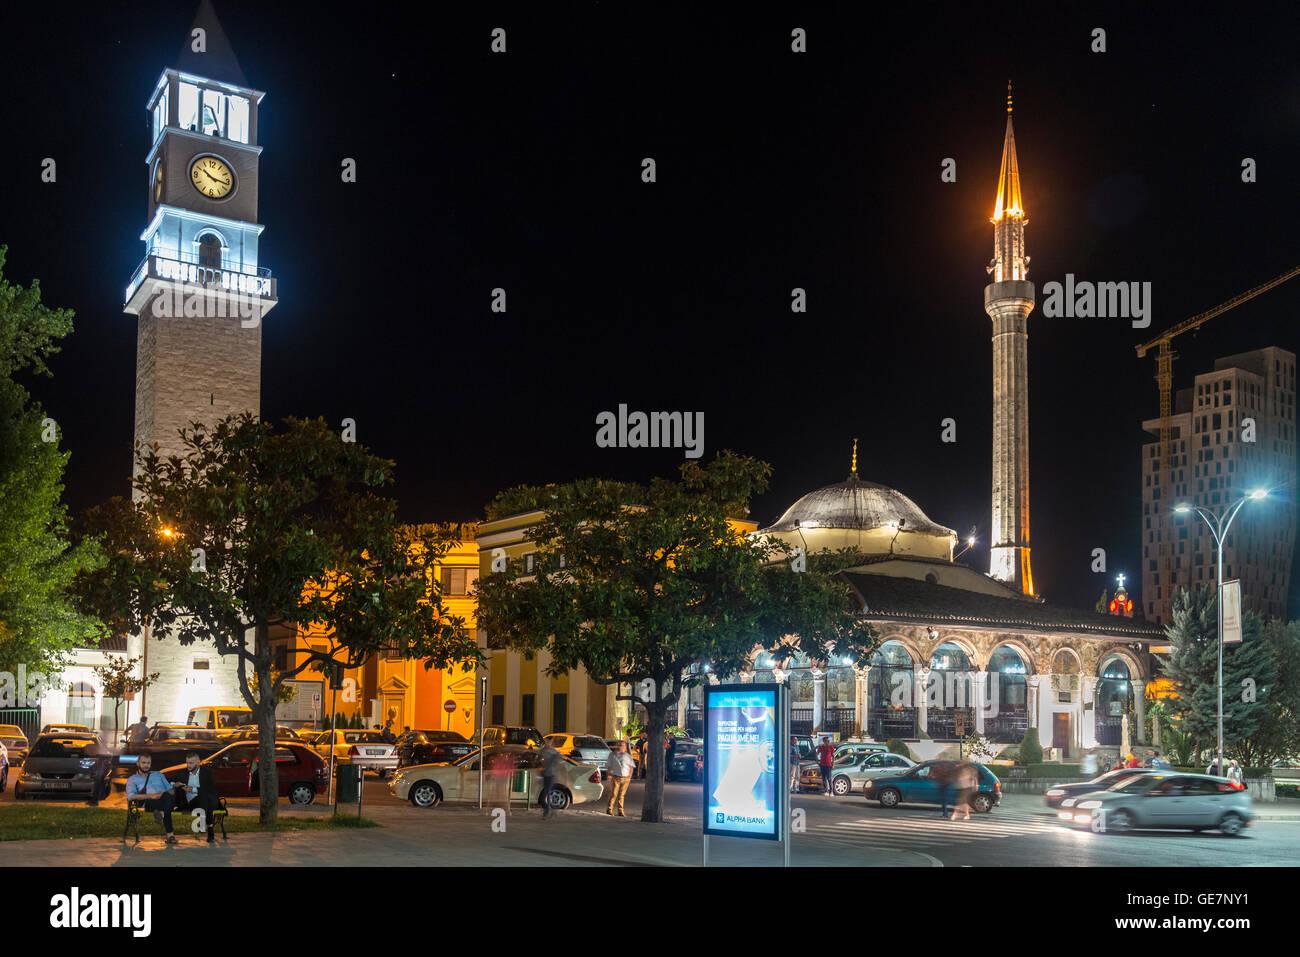 The clock tower and Et'hem Bey Mosque at night on Skanderbeg Square, Tirana, Albania, - Stock Image